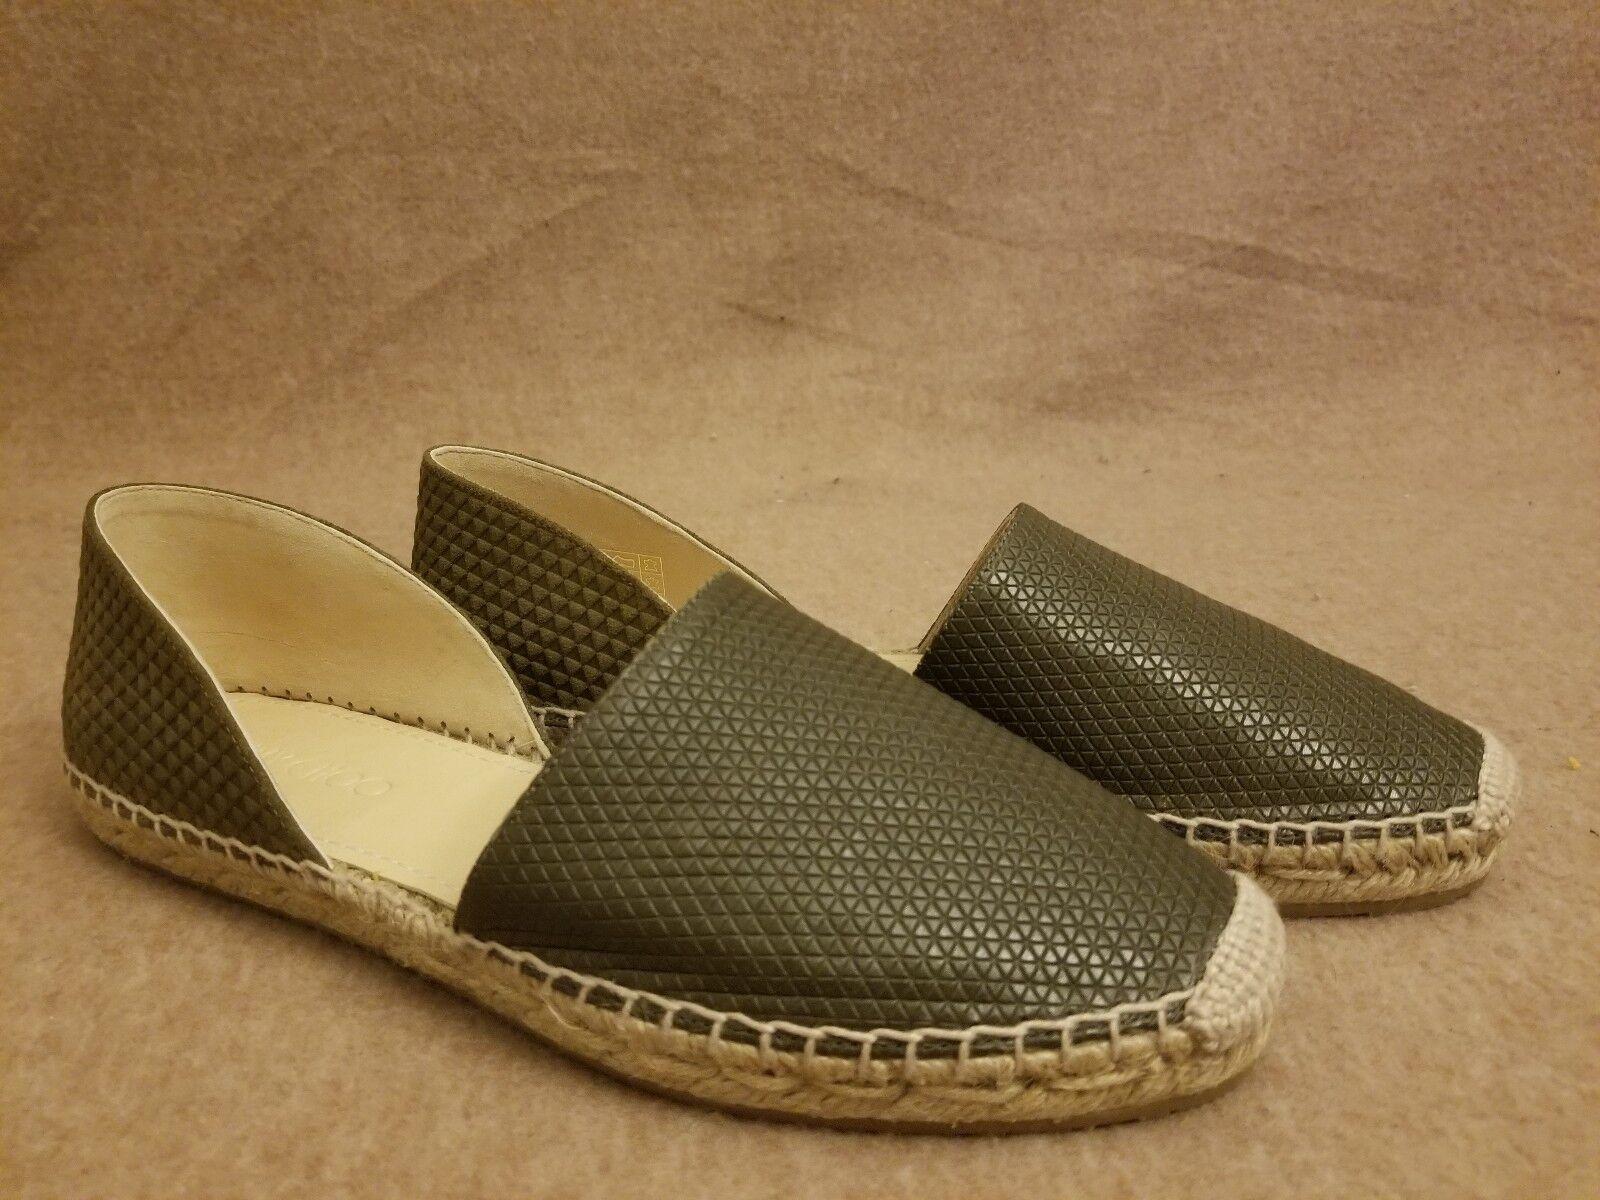 New Jimmy Choo Women Khaki D'orsay Loafers Slip On Espadrille Flat Shoes Sz 37.5